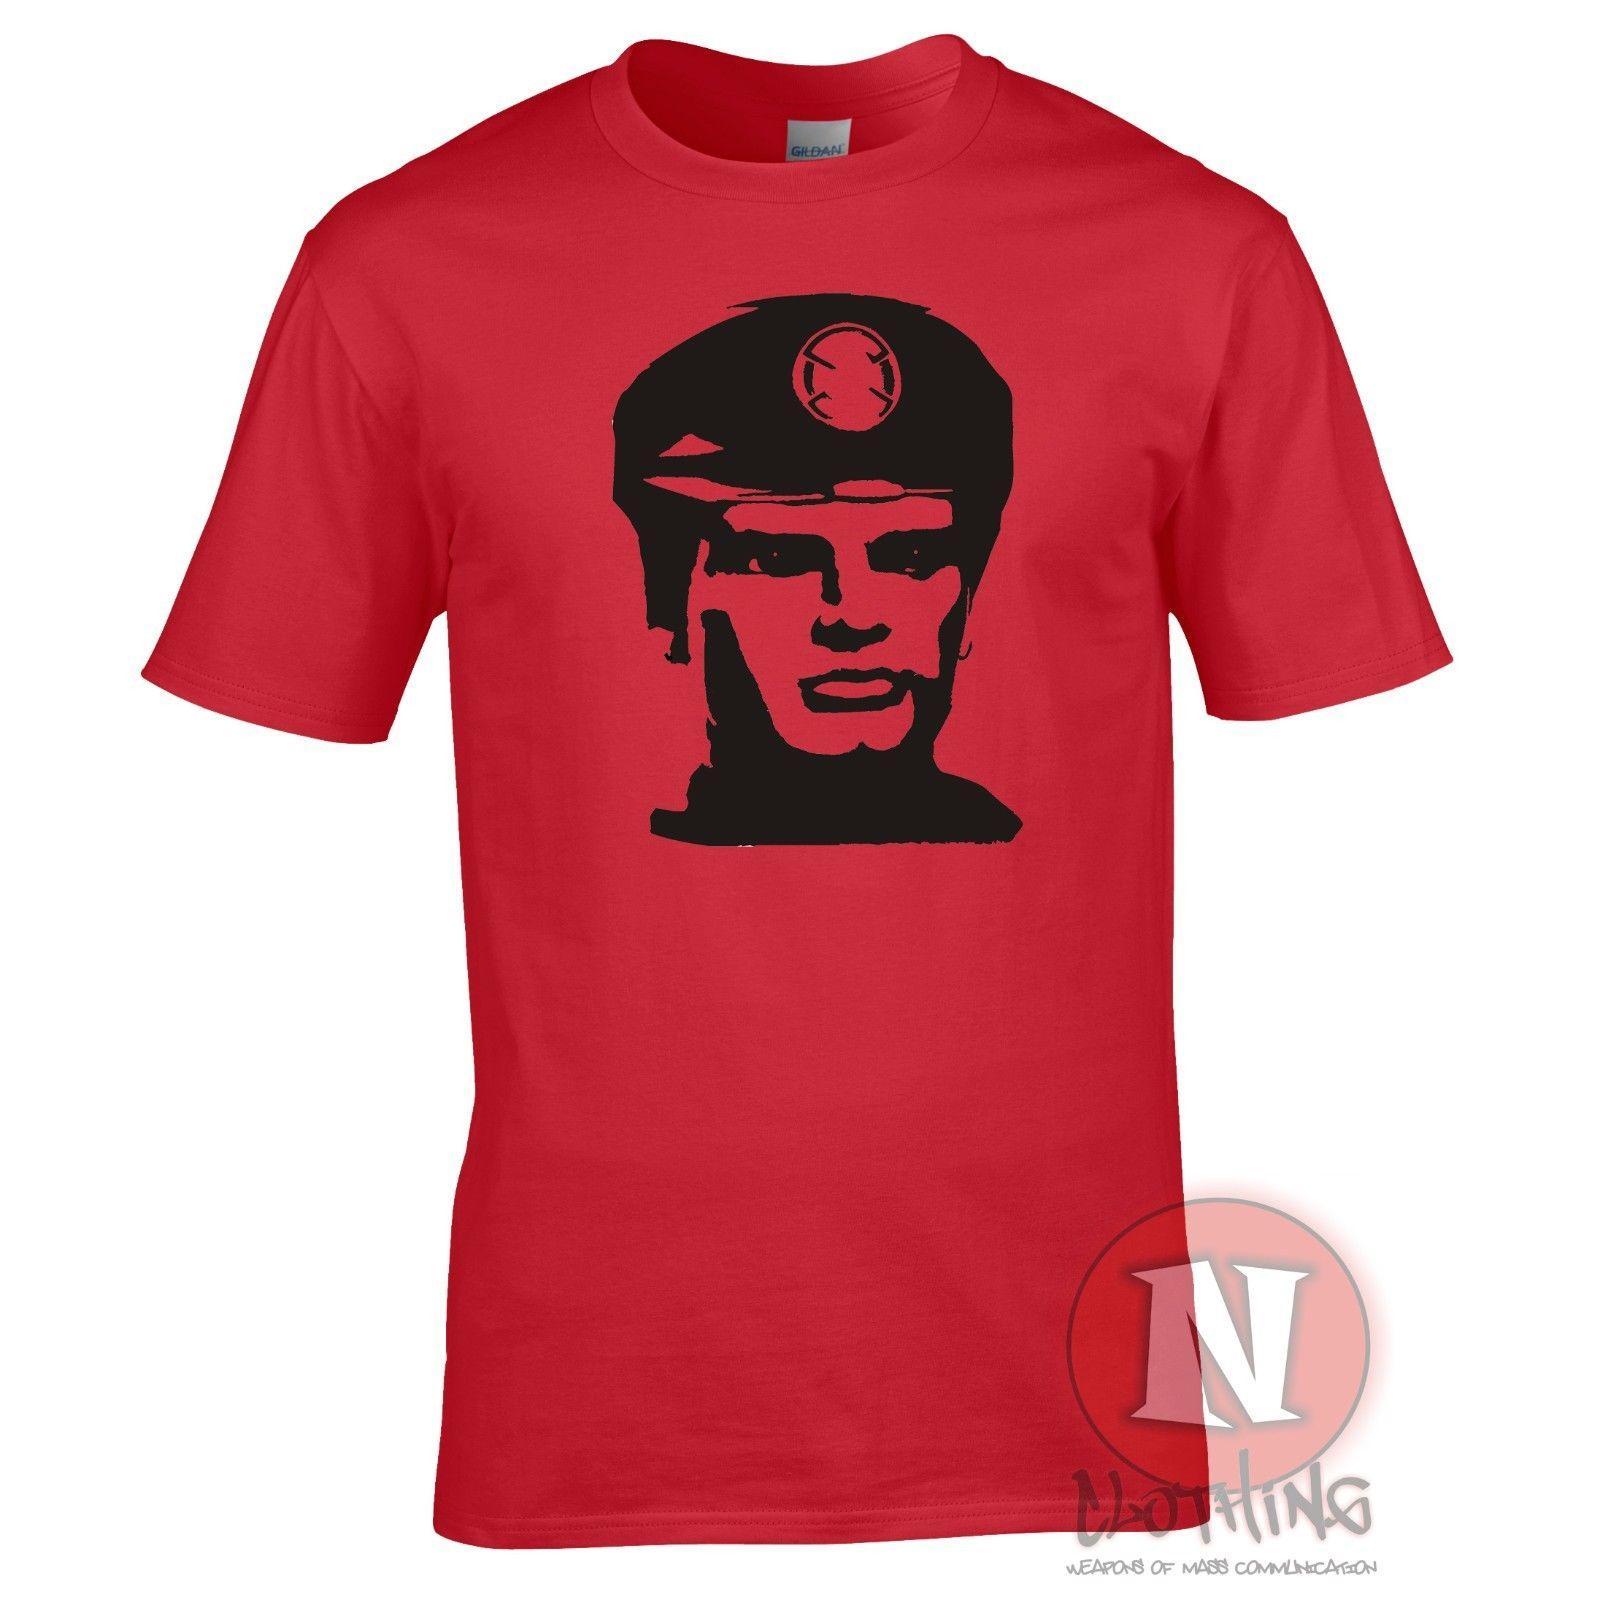 Captain Scarlet T Shirt Spectrum Mysterons Cult Sci Fi Retro Tv Tshirt Make Shirts Online Tees Design From Spreadshirt 1156